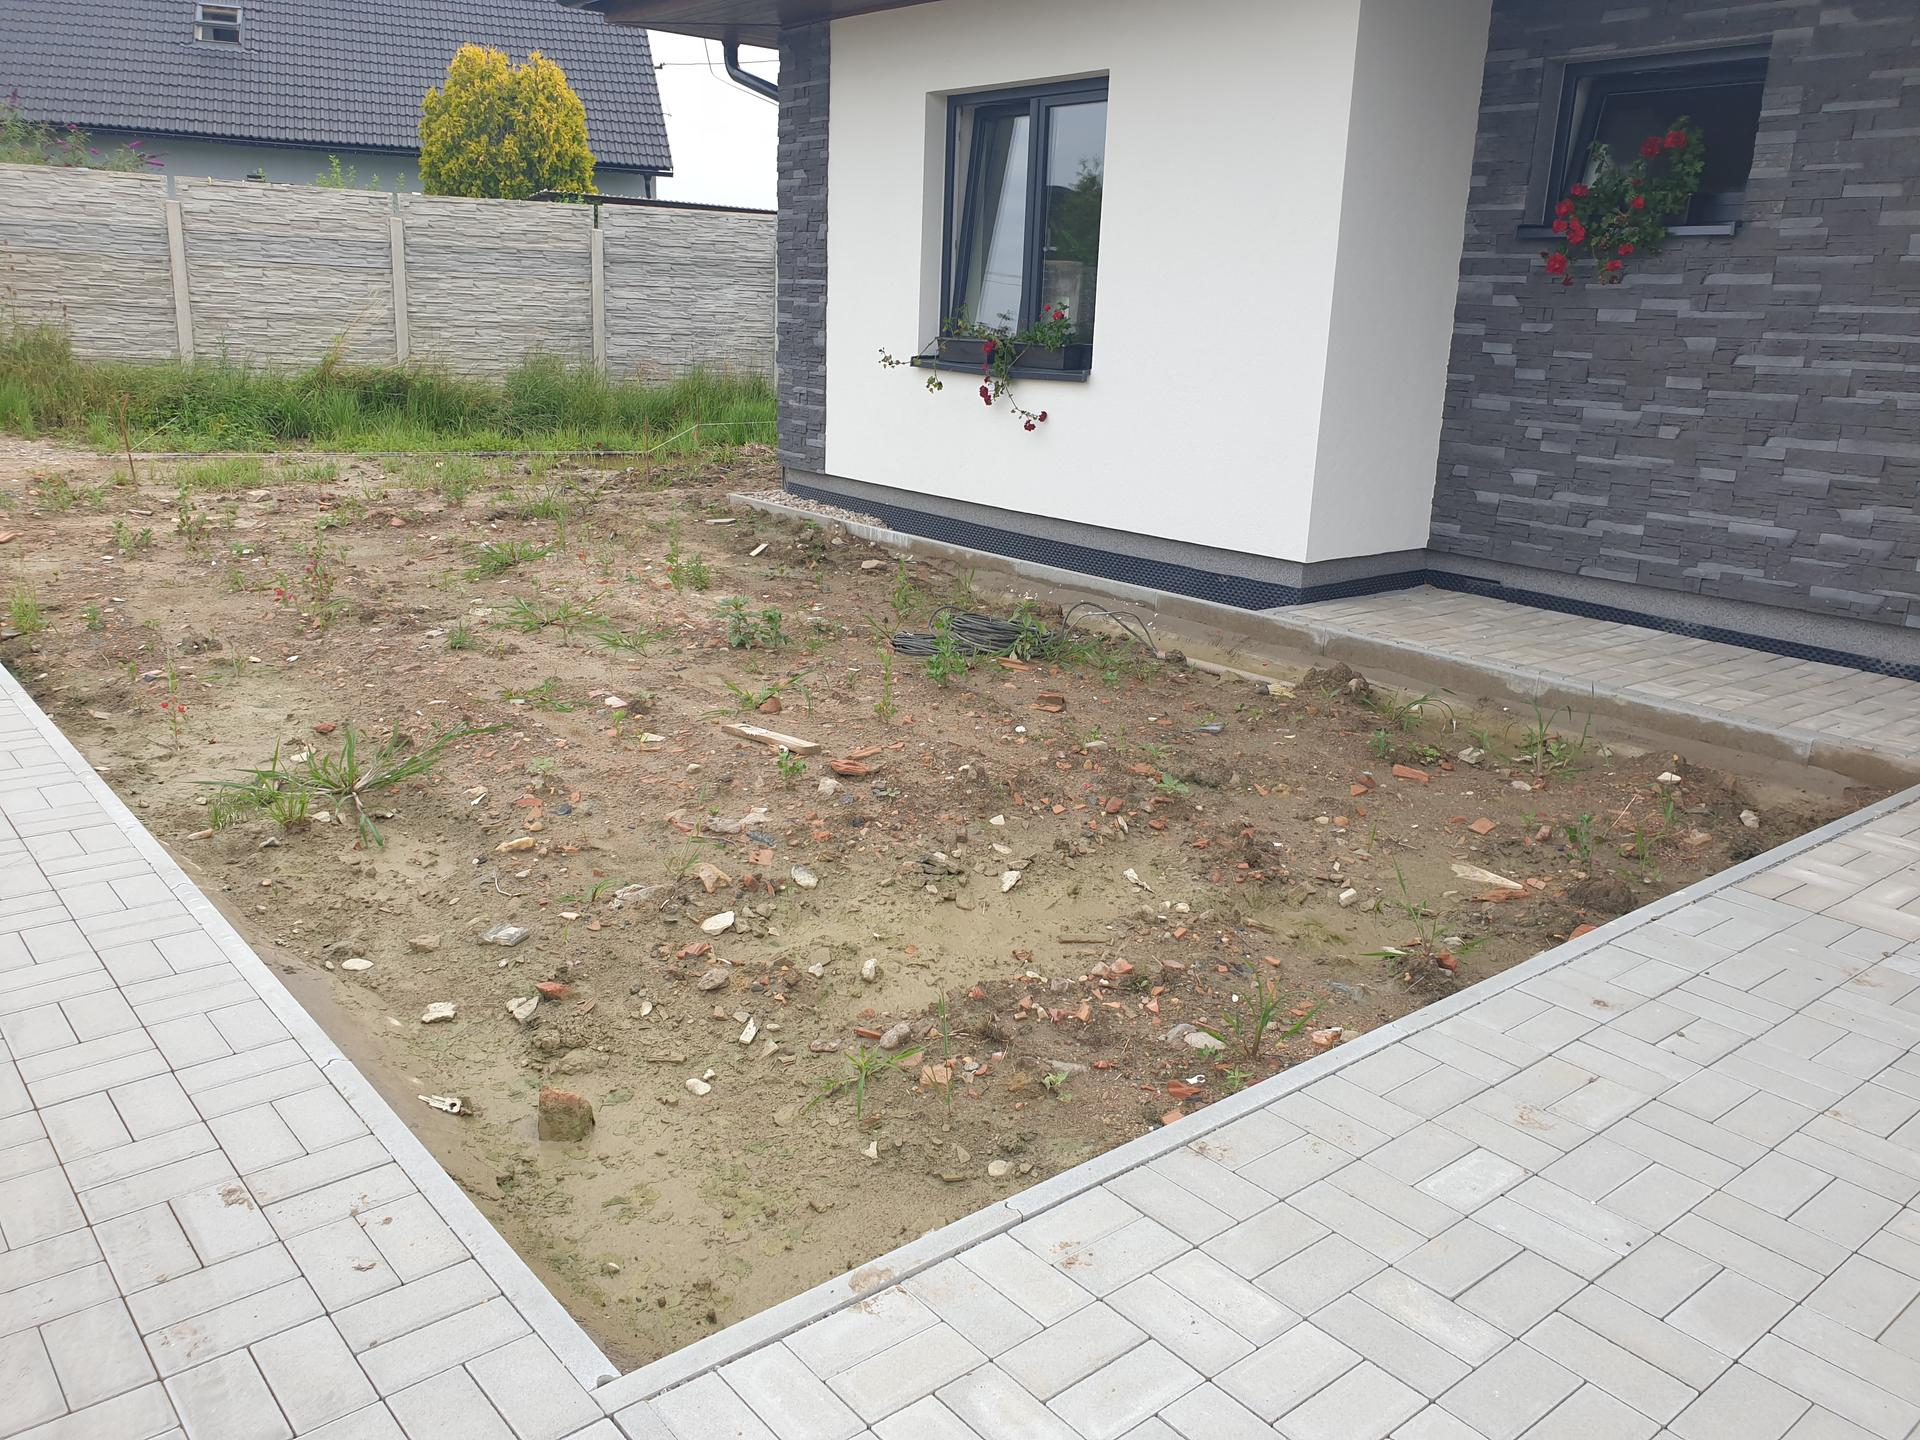 Zahrada a terasa - Obrázek č. 41